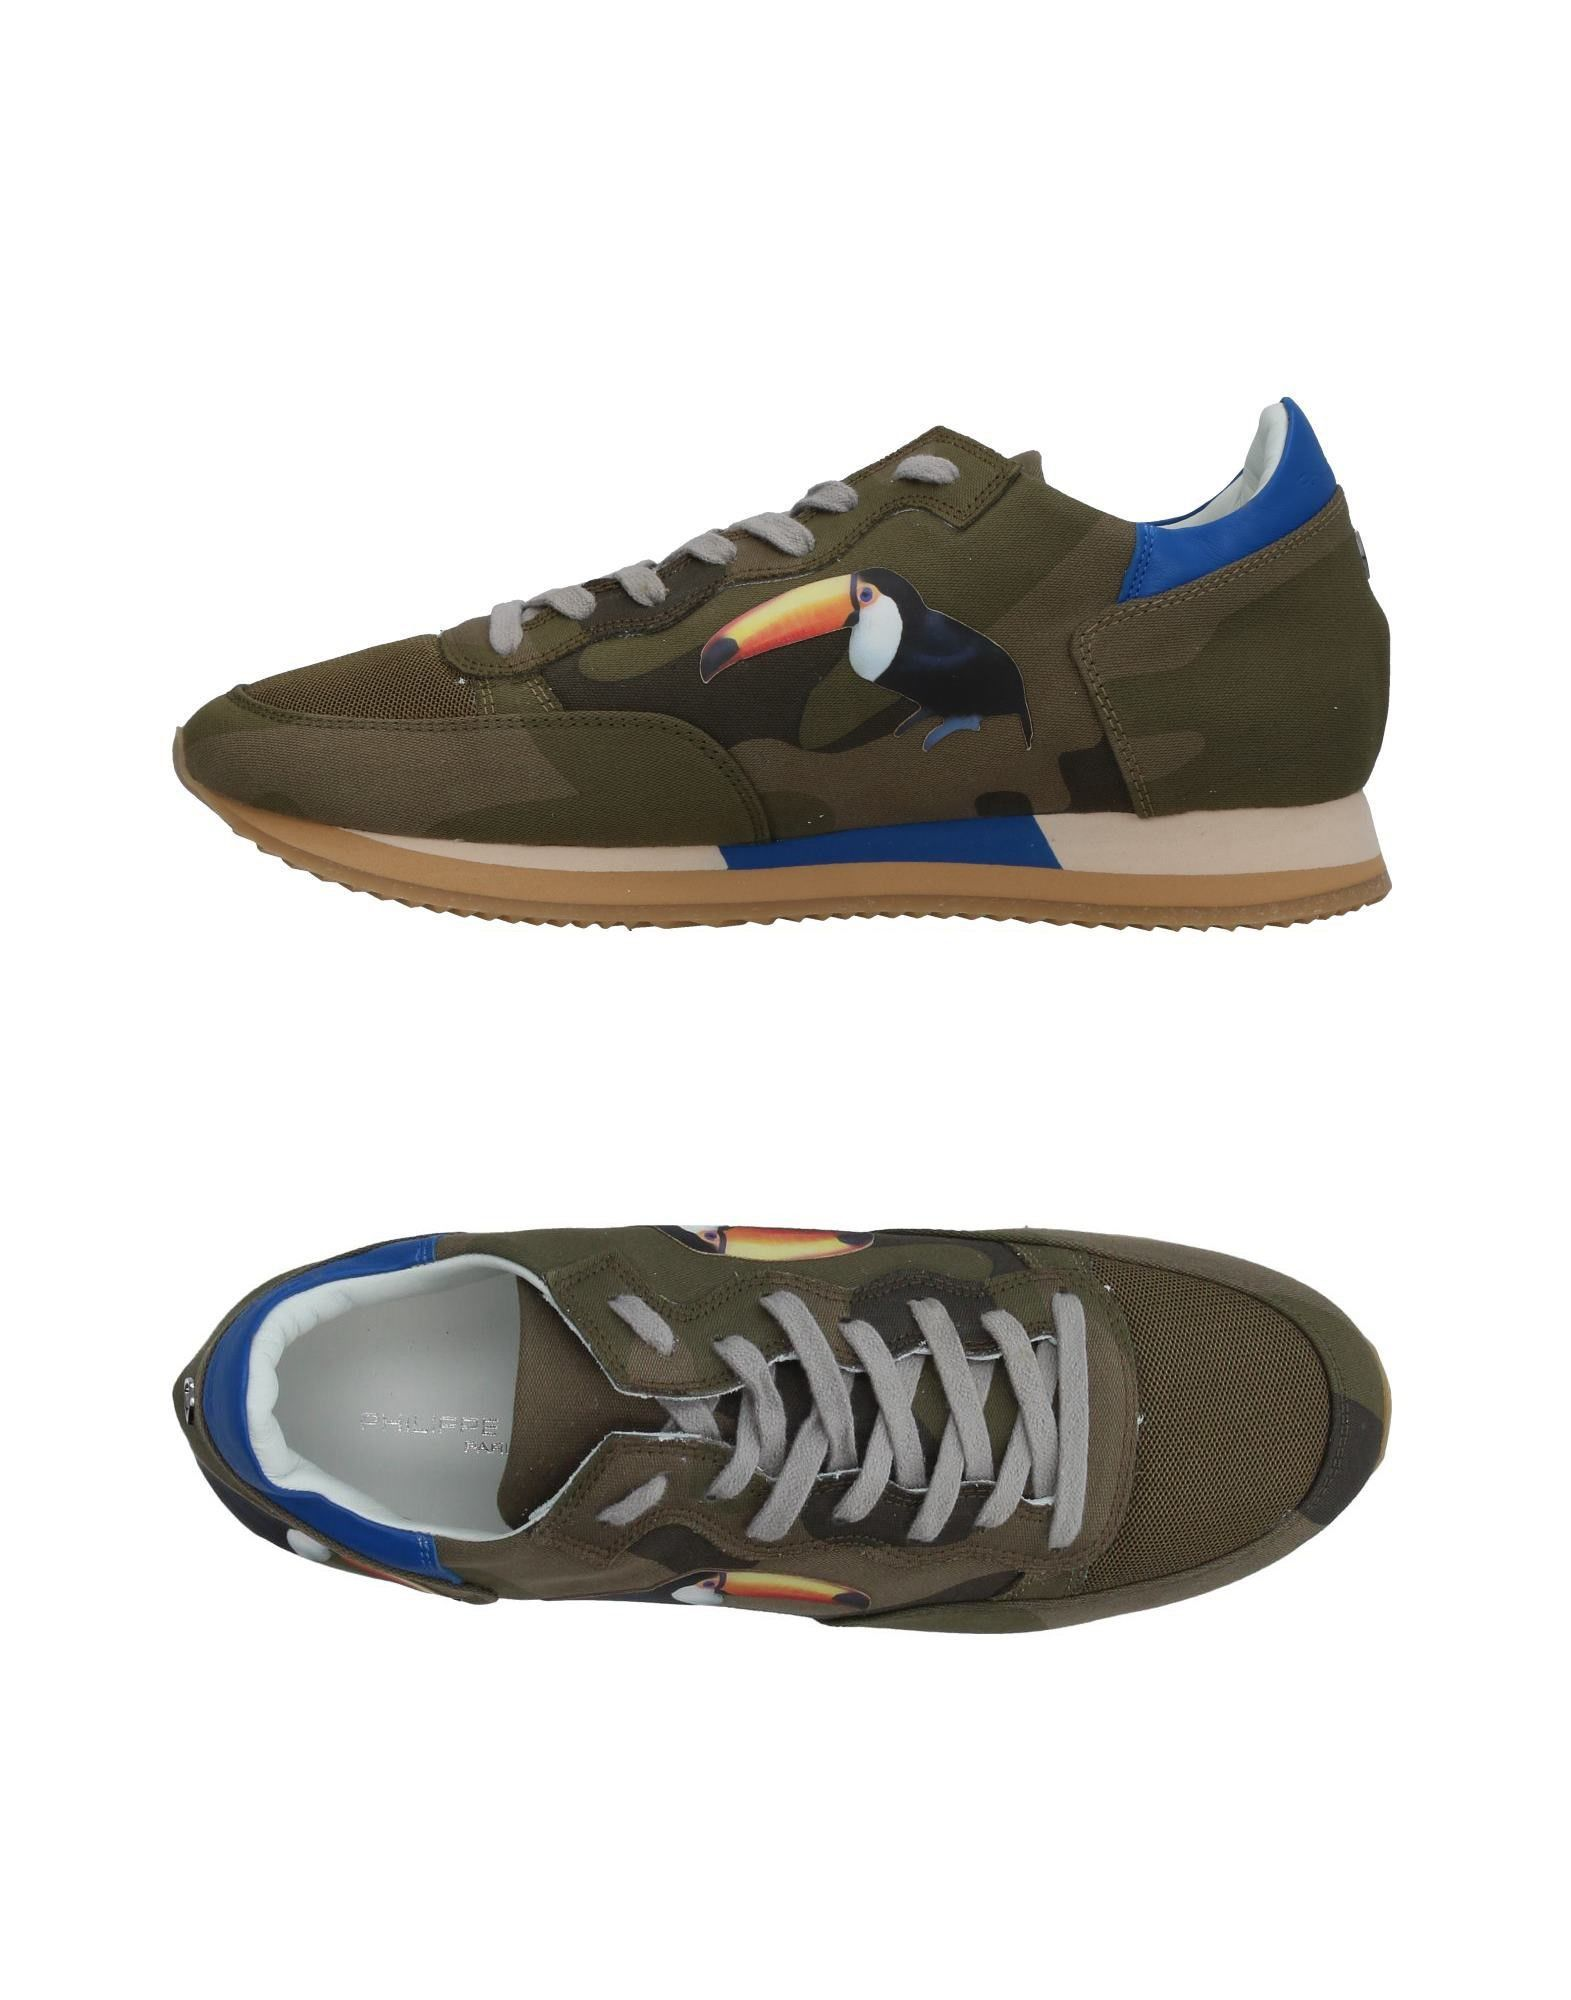 Philippe 11404502WV Model Sneakers Herren  11404502WV Philippe Gute Qualität beliebte Schuhe 7d3a06